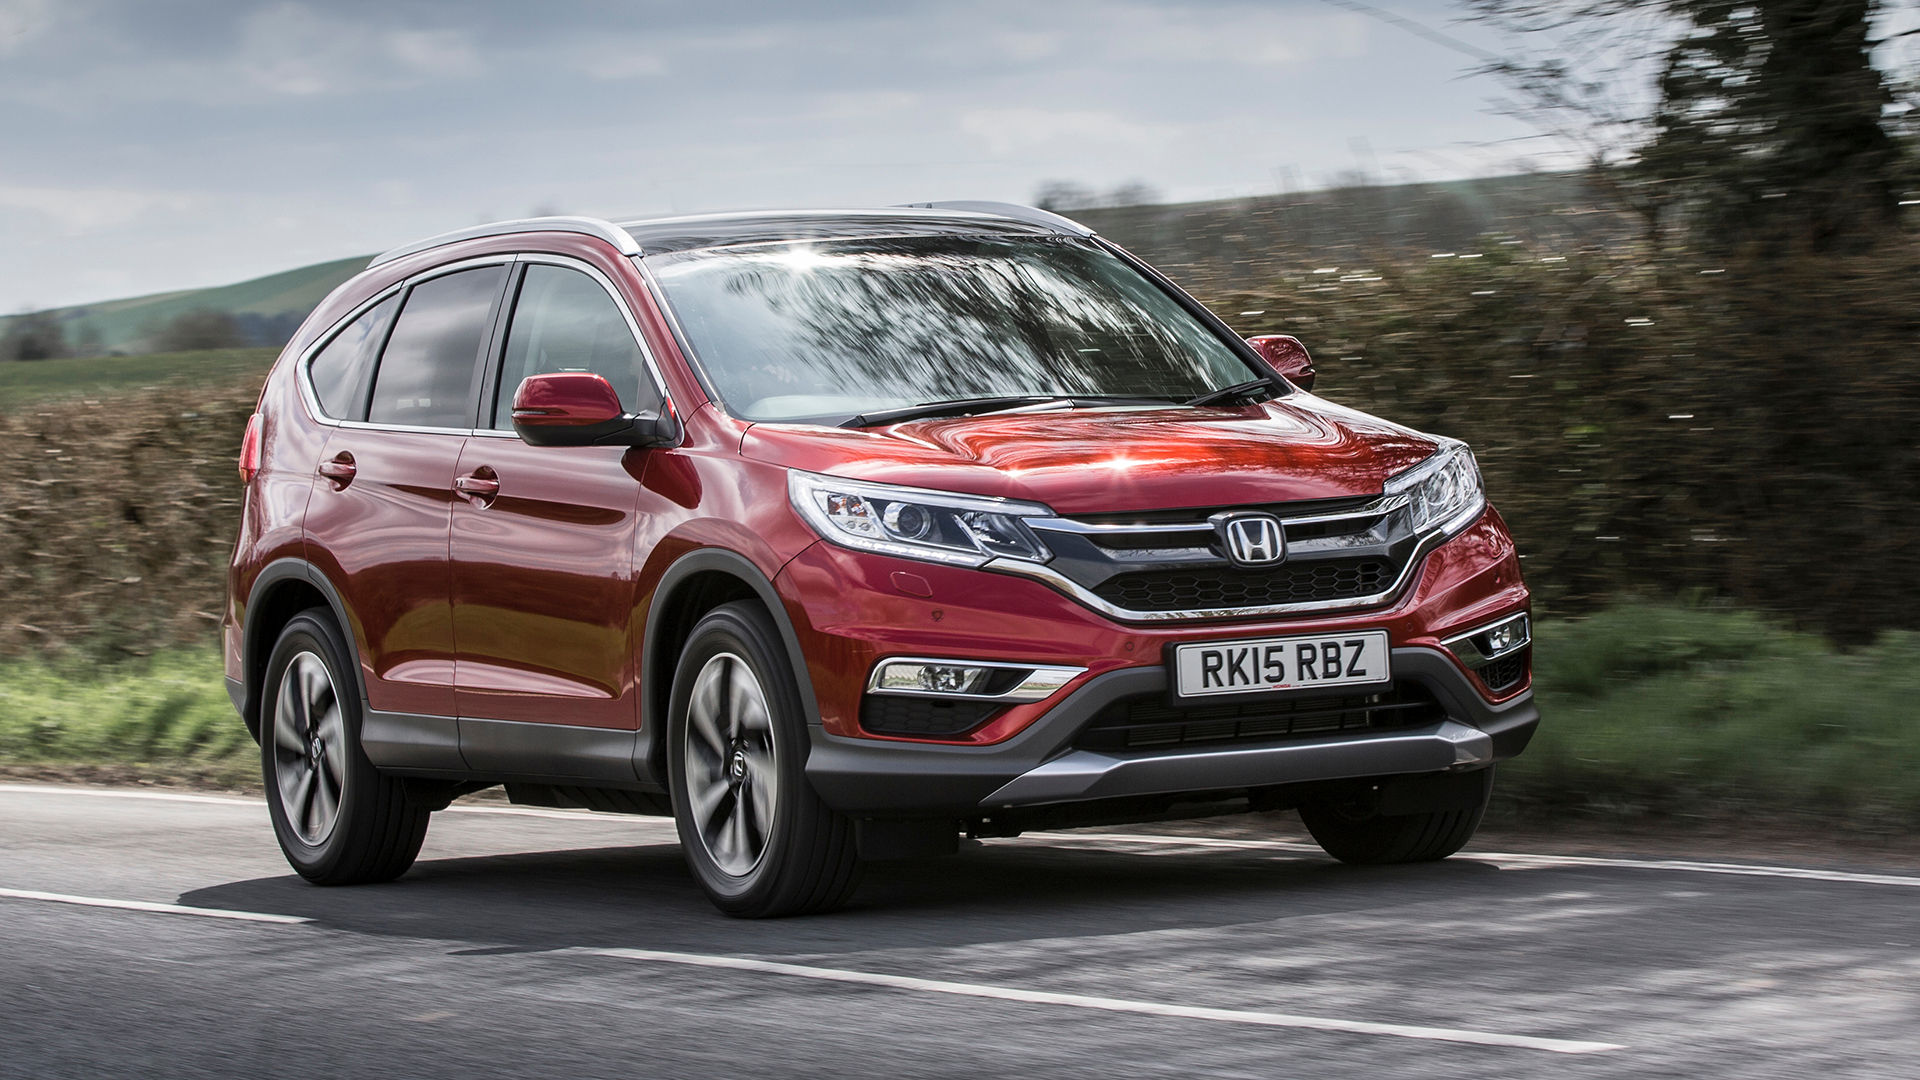 Honda Crv For Sale Near Me >> New Used Honda Cr V Cars For Sale Auto Trader